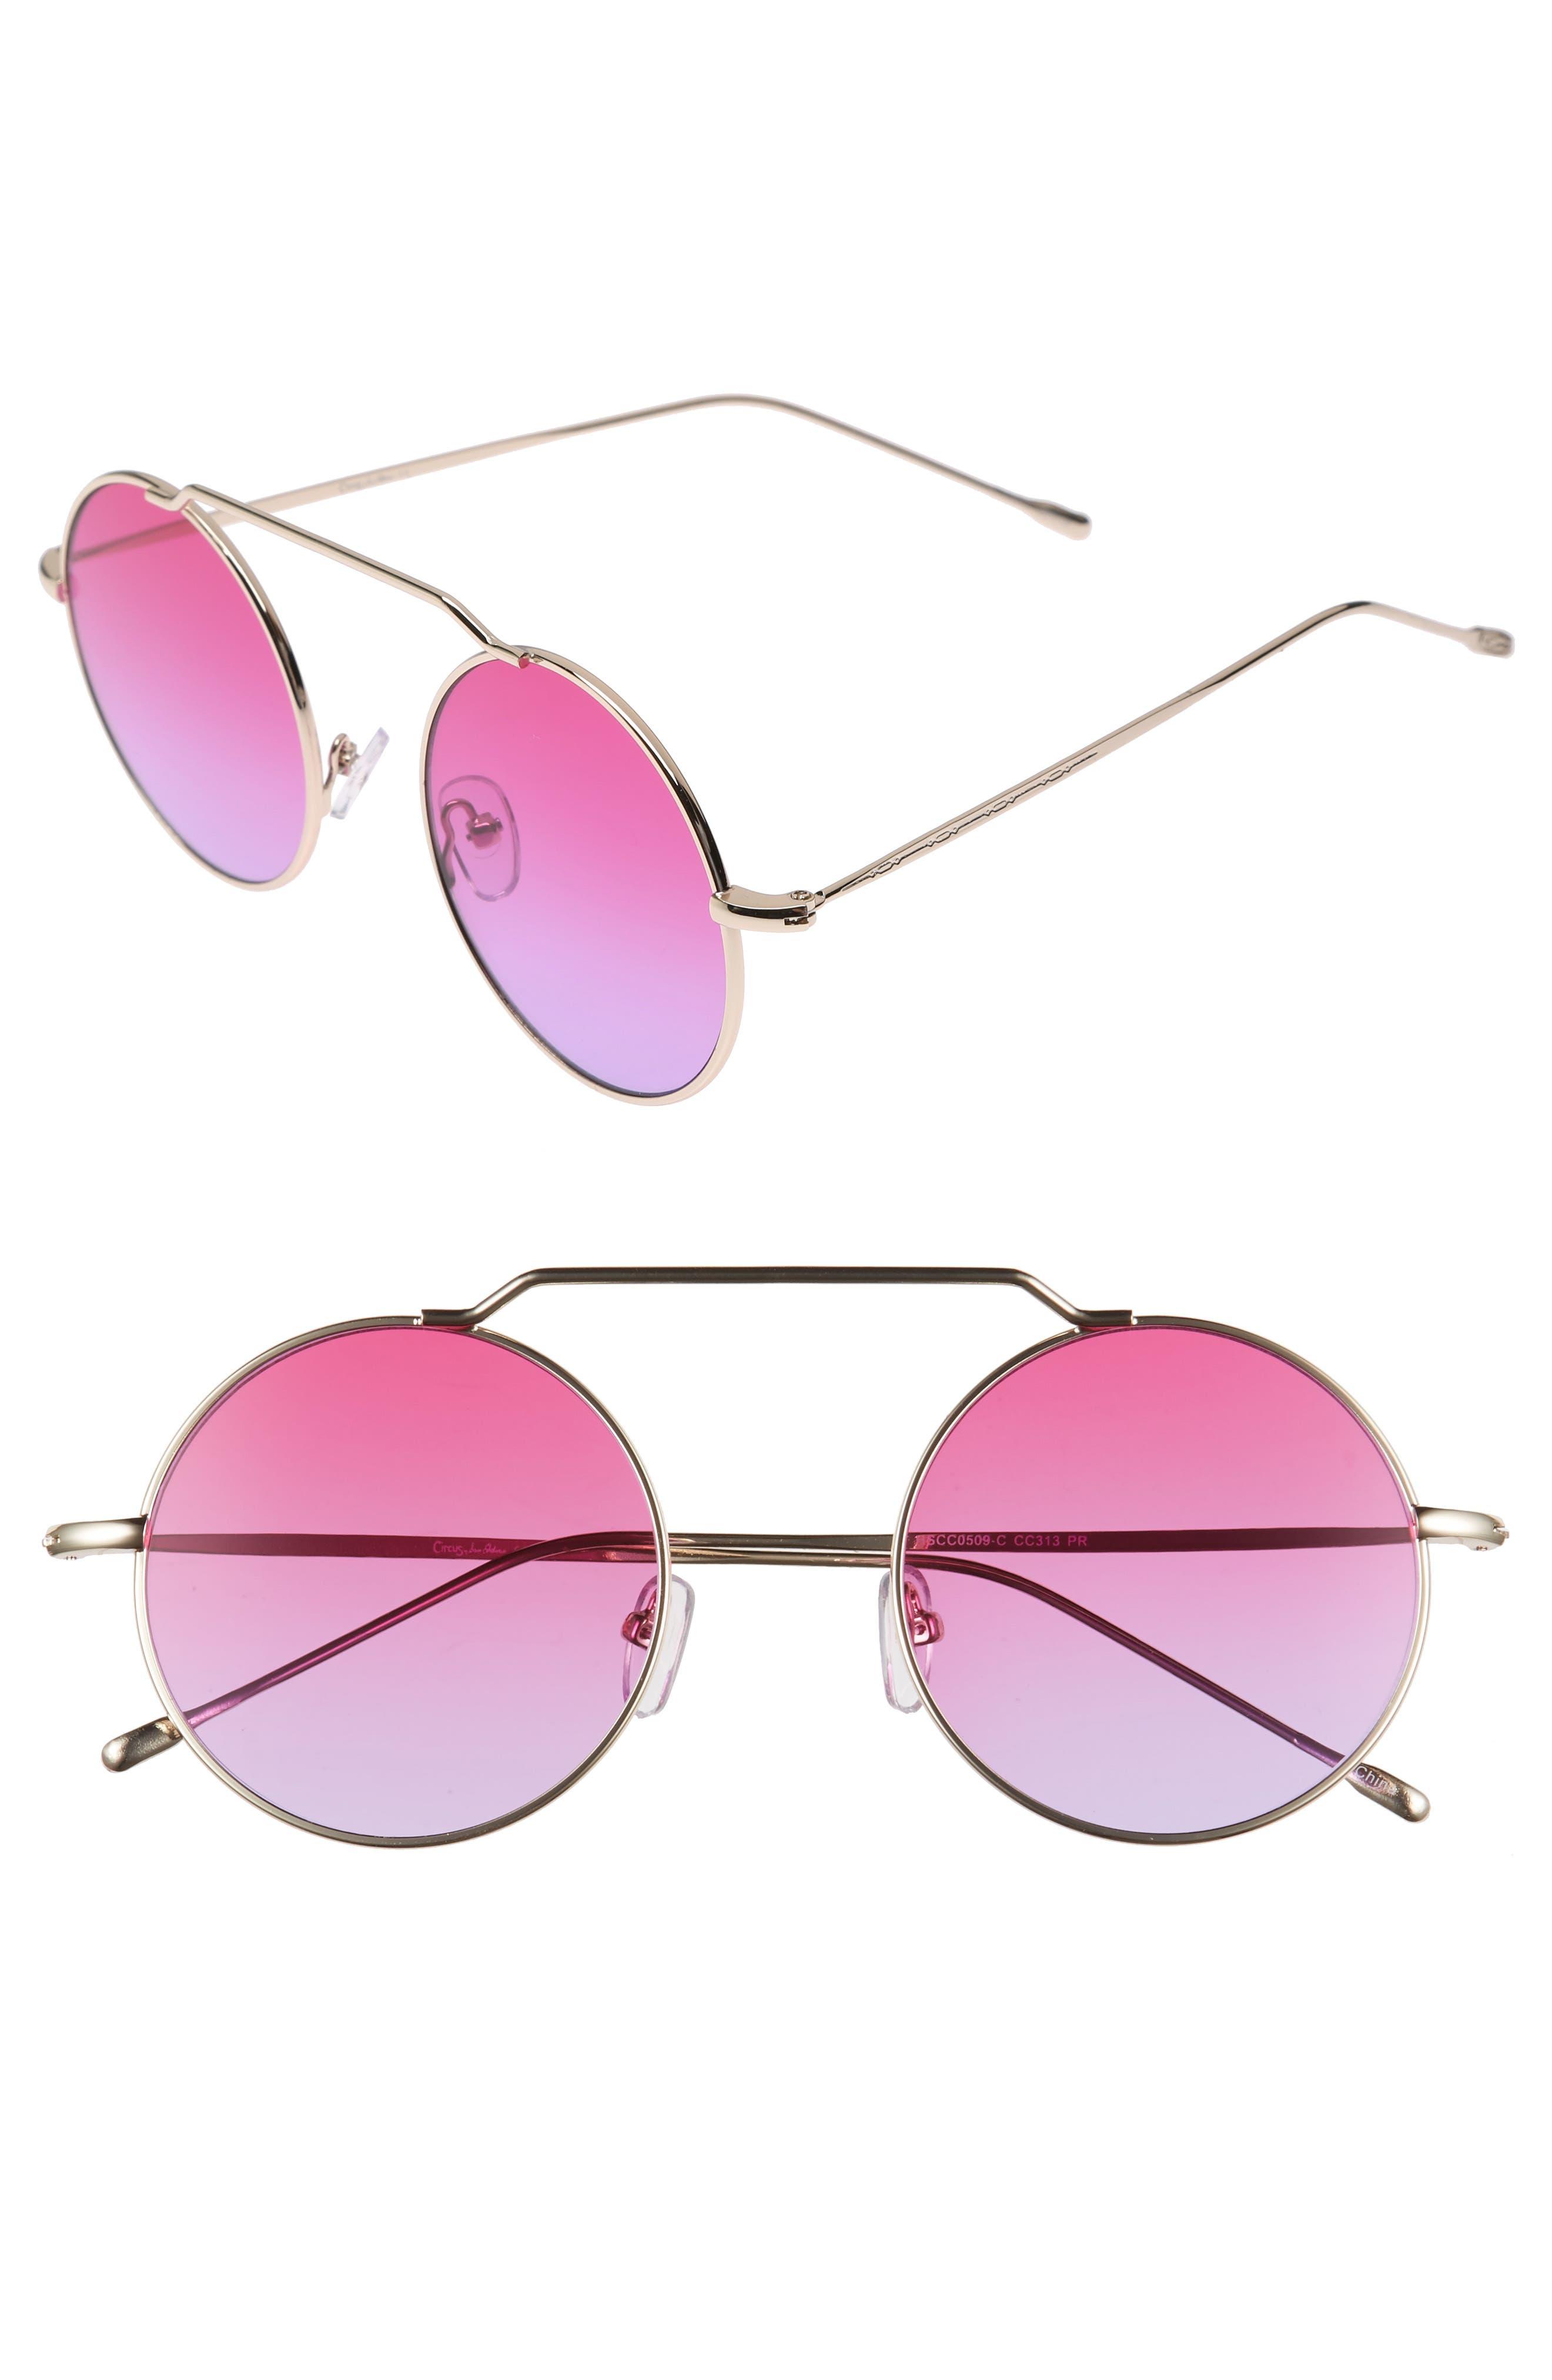 51mm Brow Bar Round Sunglasses,                             Main thumbnail 3, color,